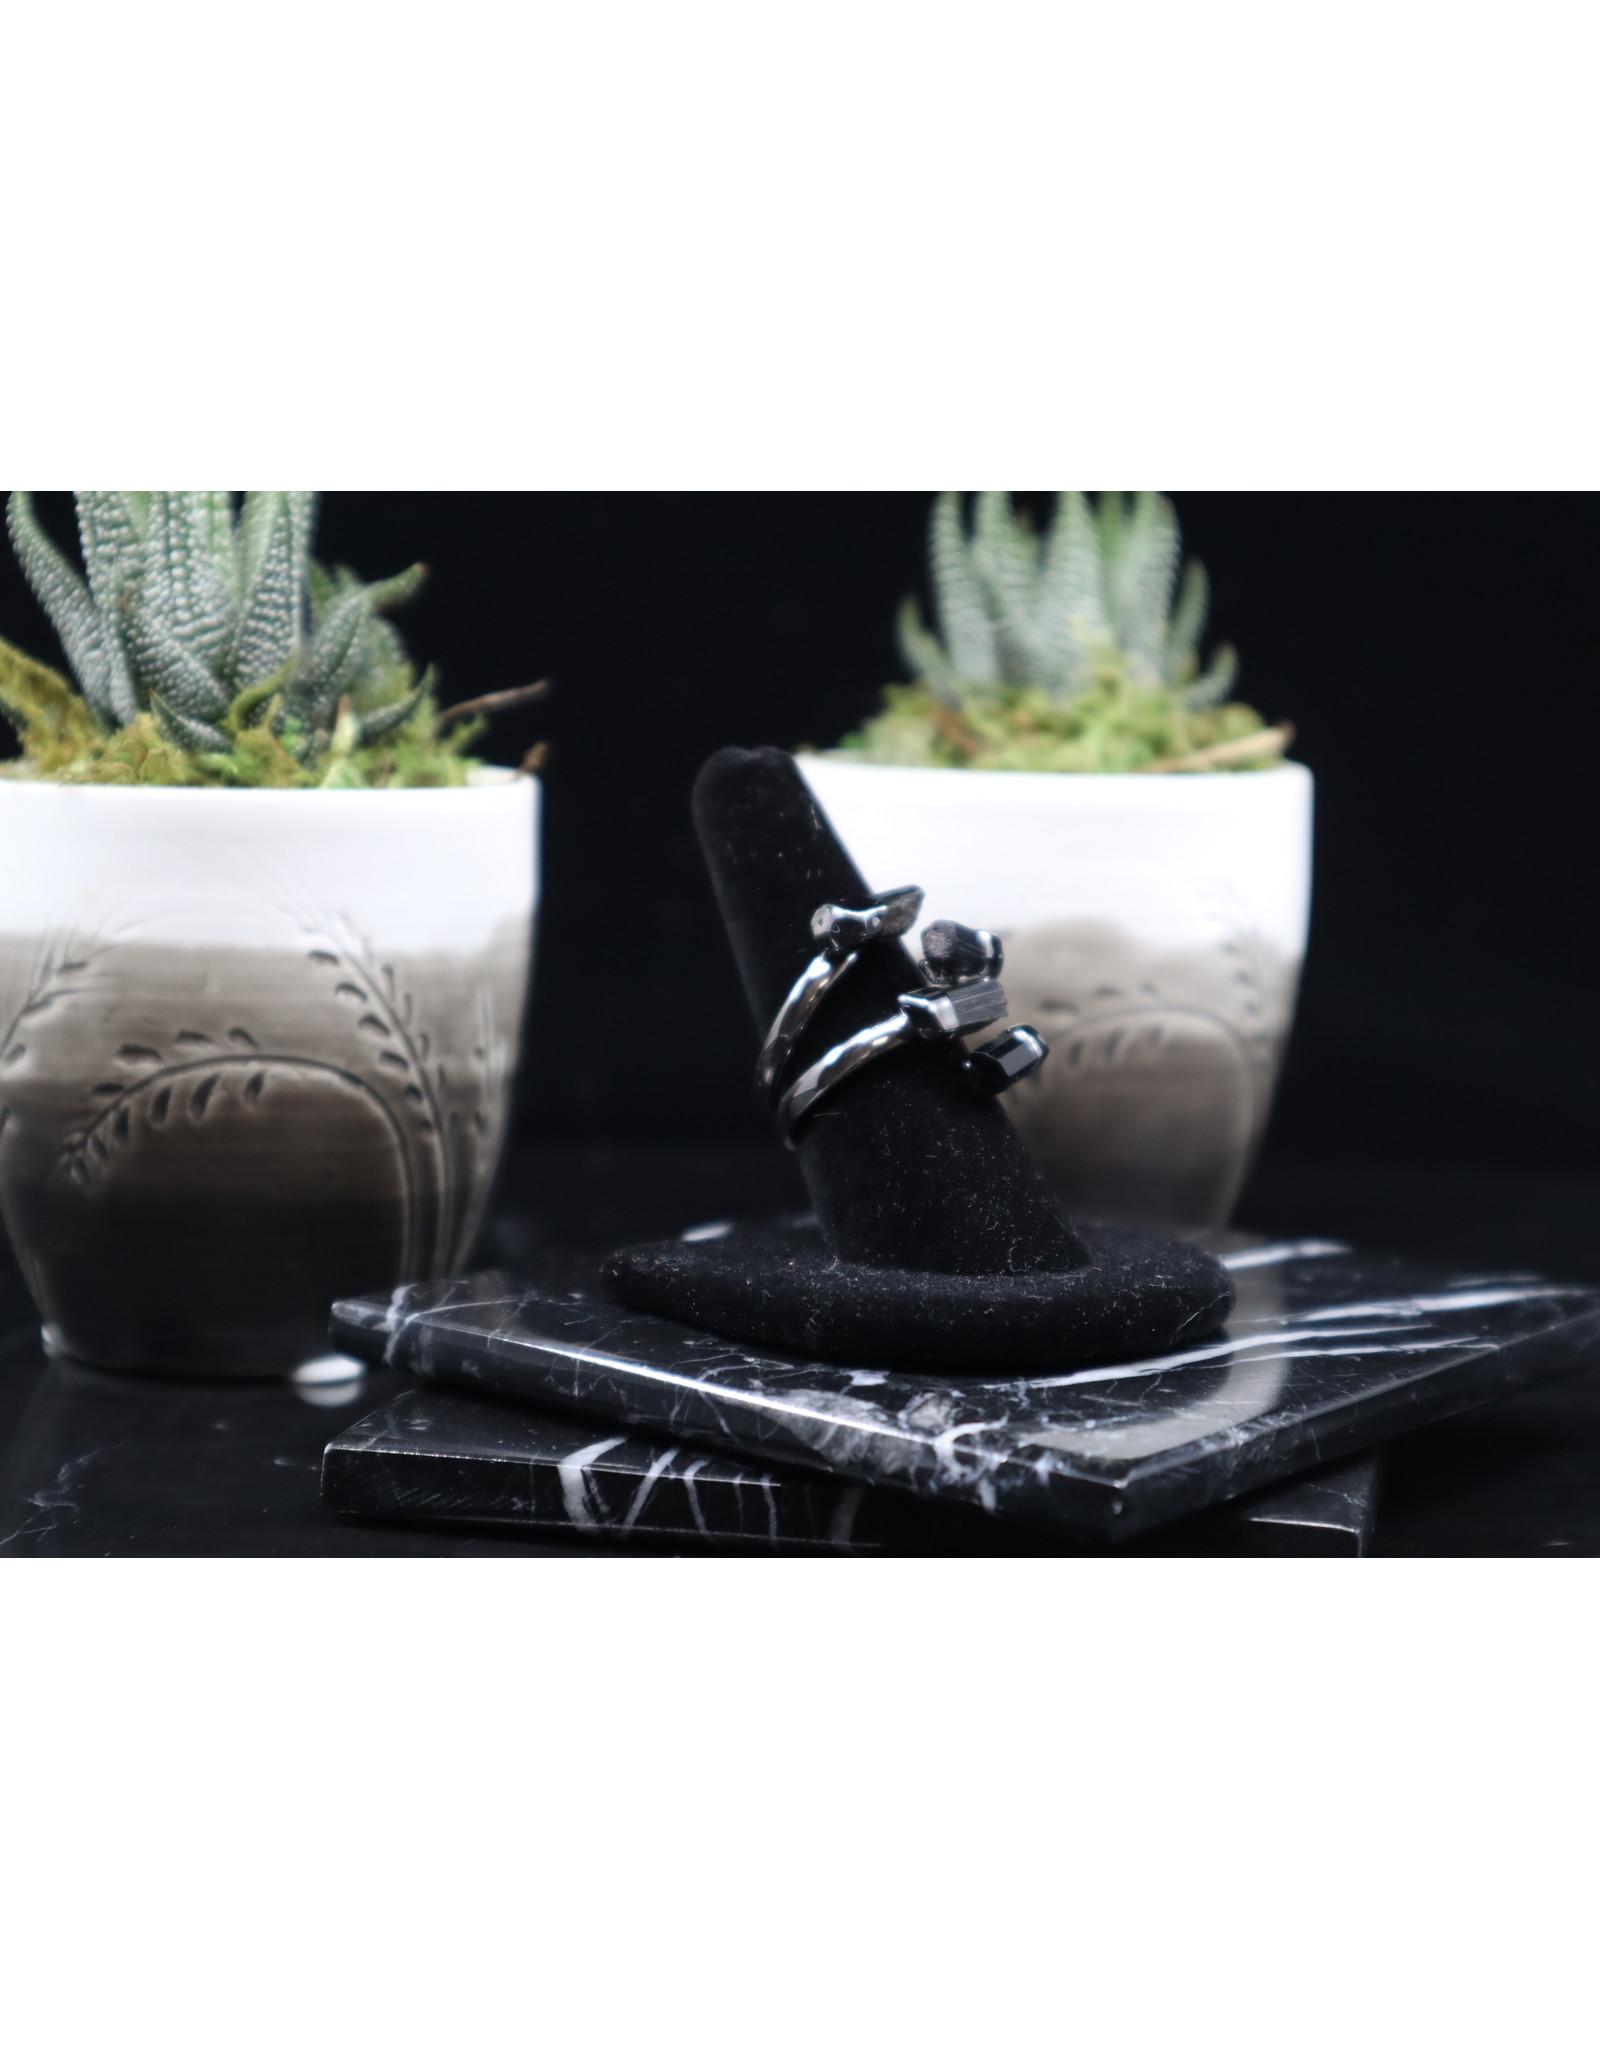 Black Tourmaline Ring - 4 stone